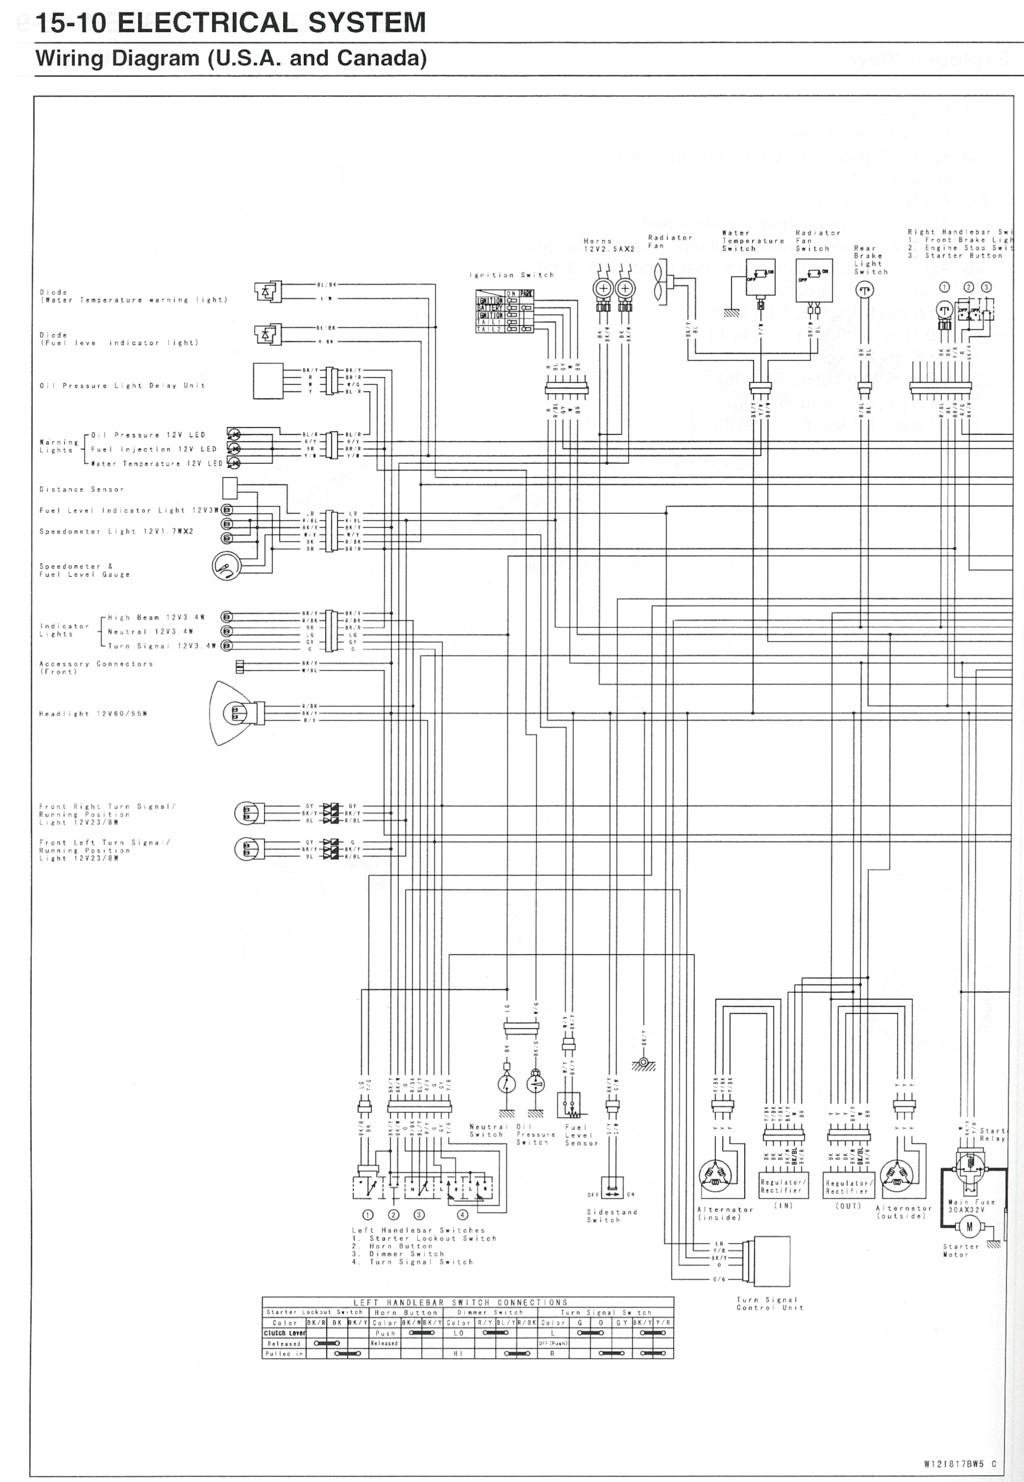 2001 Prowler Wiring Diagram Dodge Ram Trailer Wiring Harness Diagram Pump Yenpancane Jeanjaures37 Fr